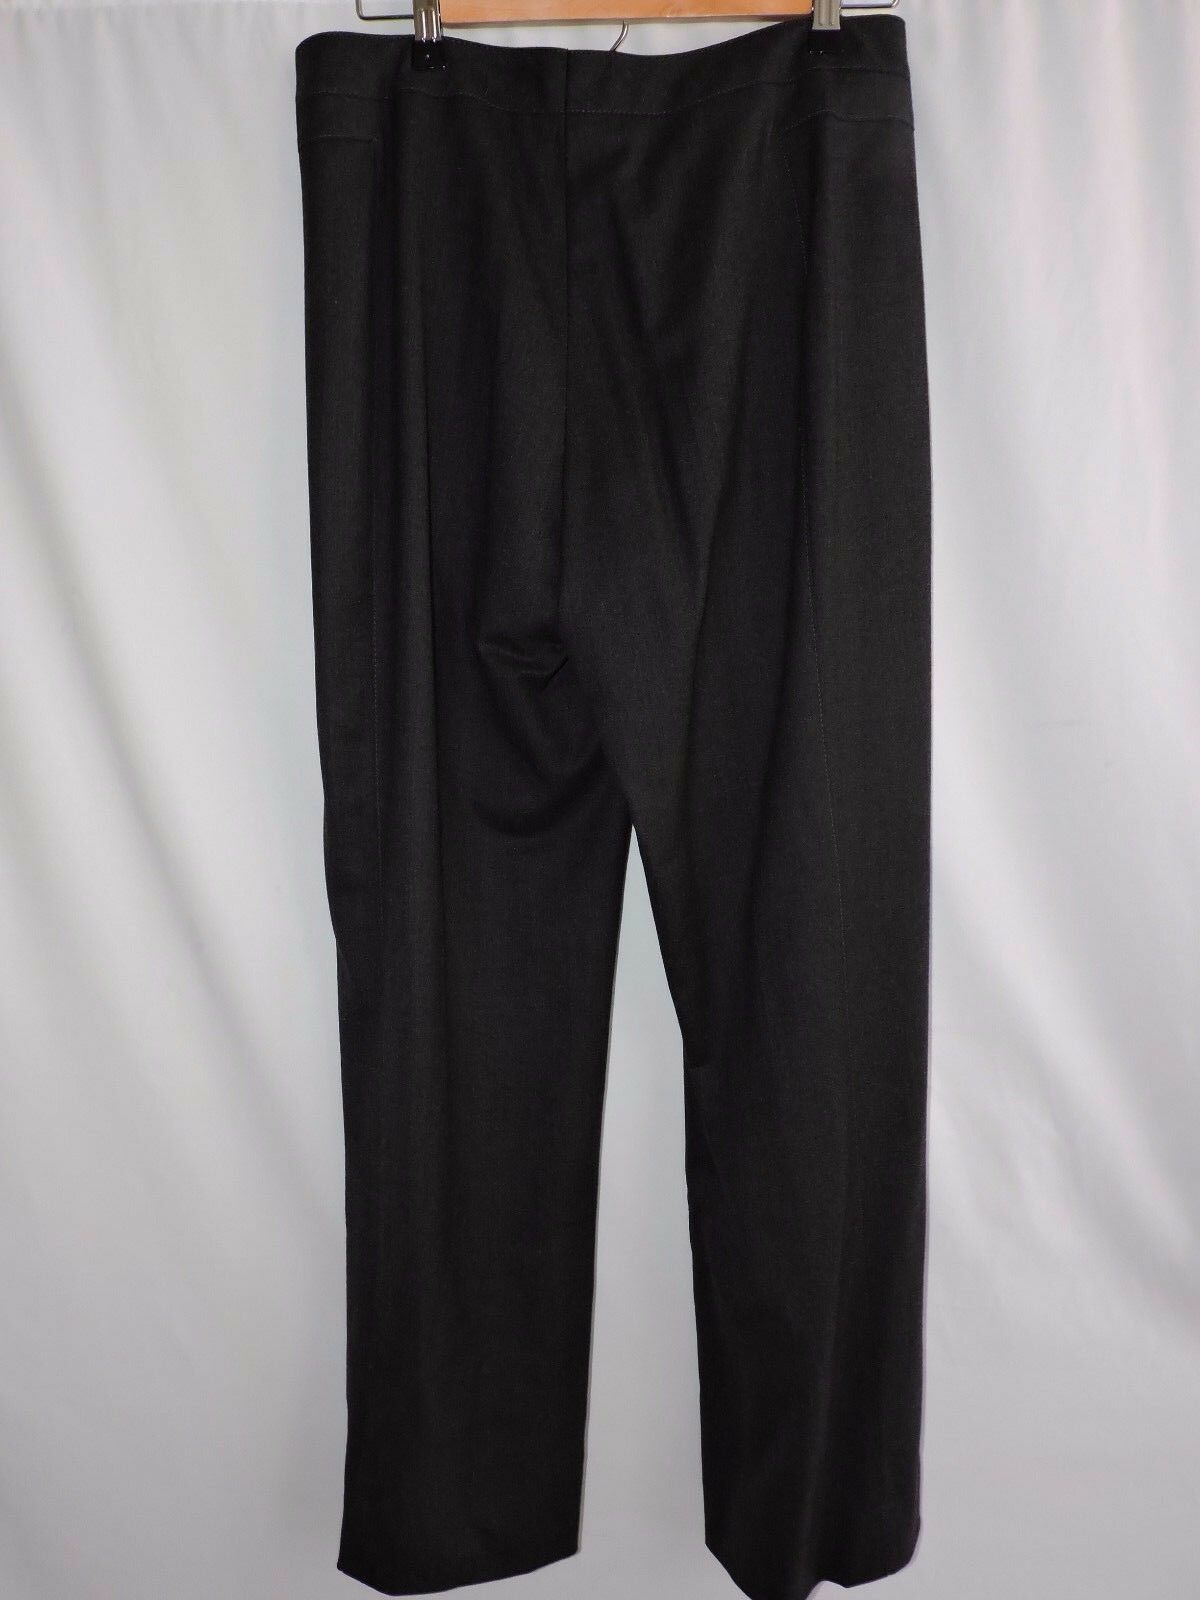 Escada Gray Wool Blend Dress Pants Wide Leg Flat Front Career Work 40 US size 10